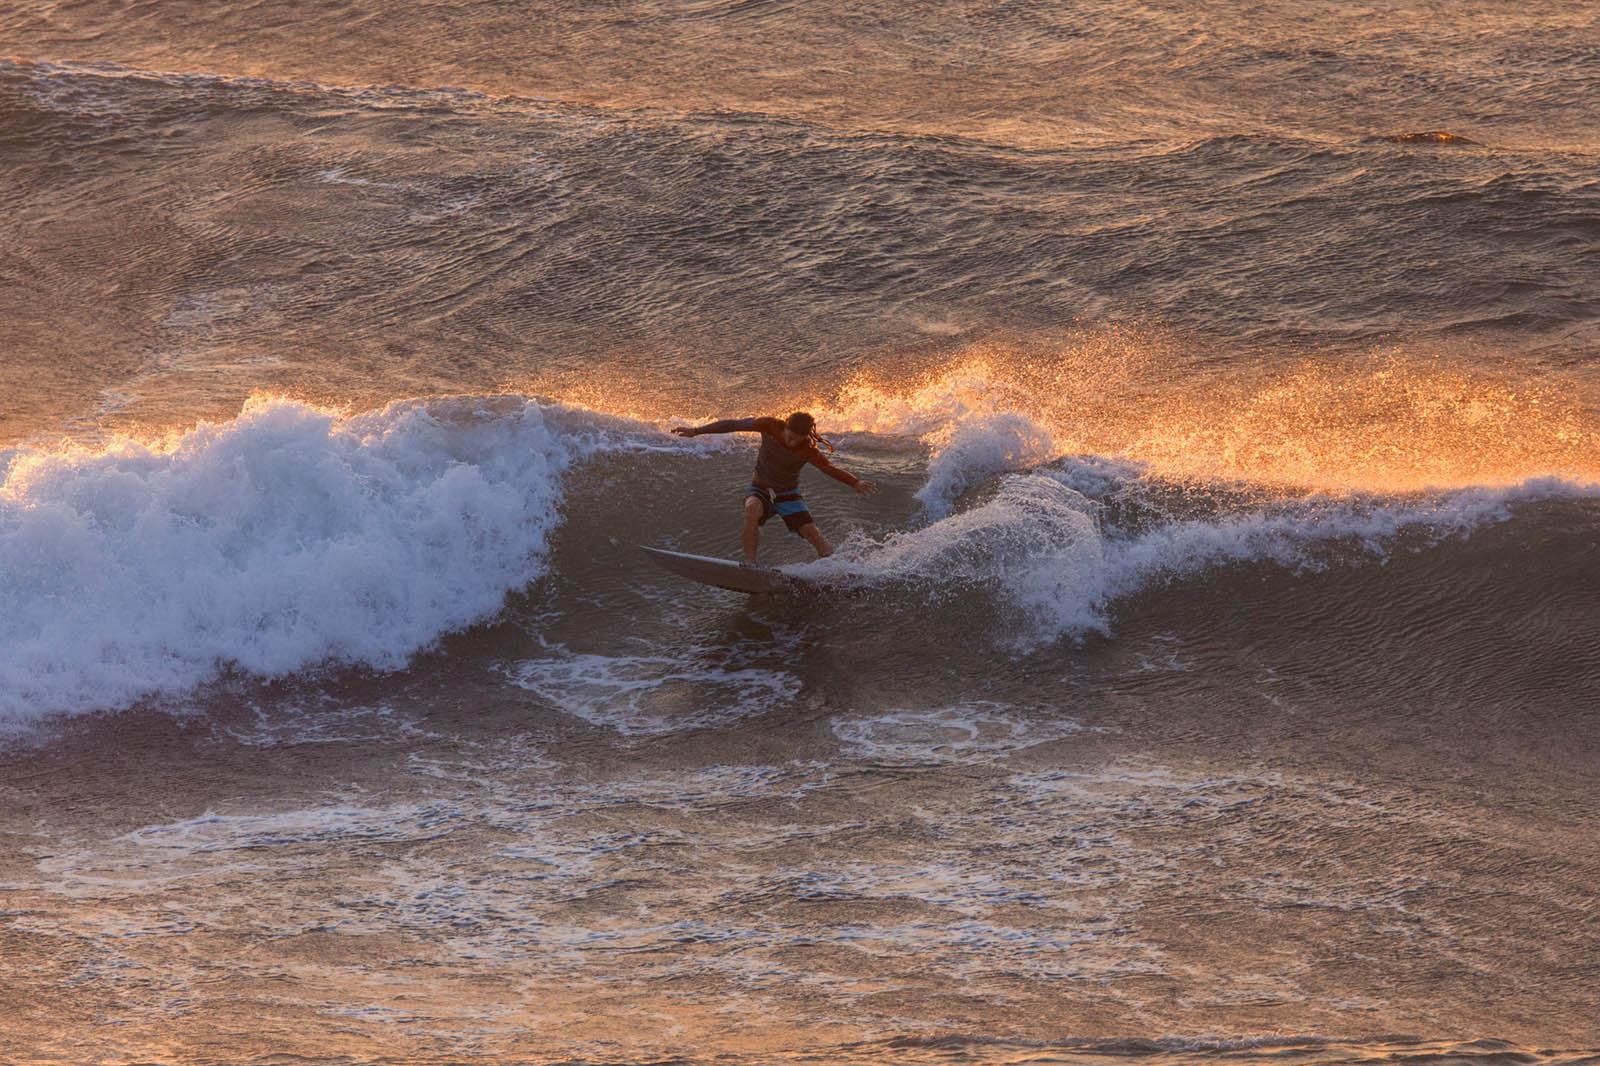 Visit Elba Island Tuscany Tourism Surfing The Waves